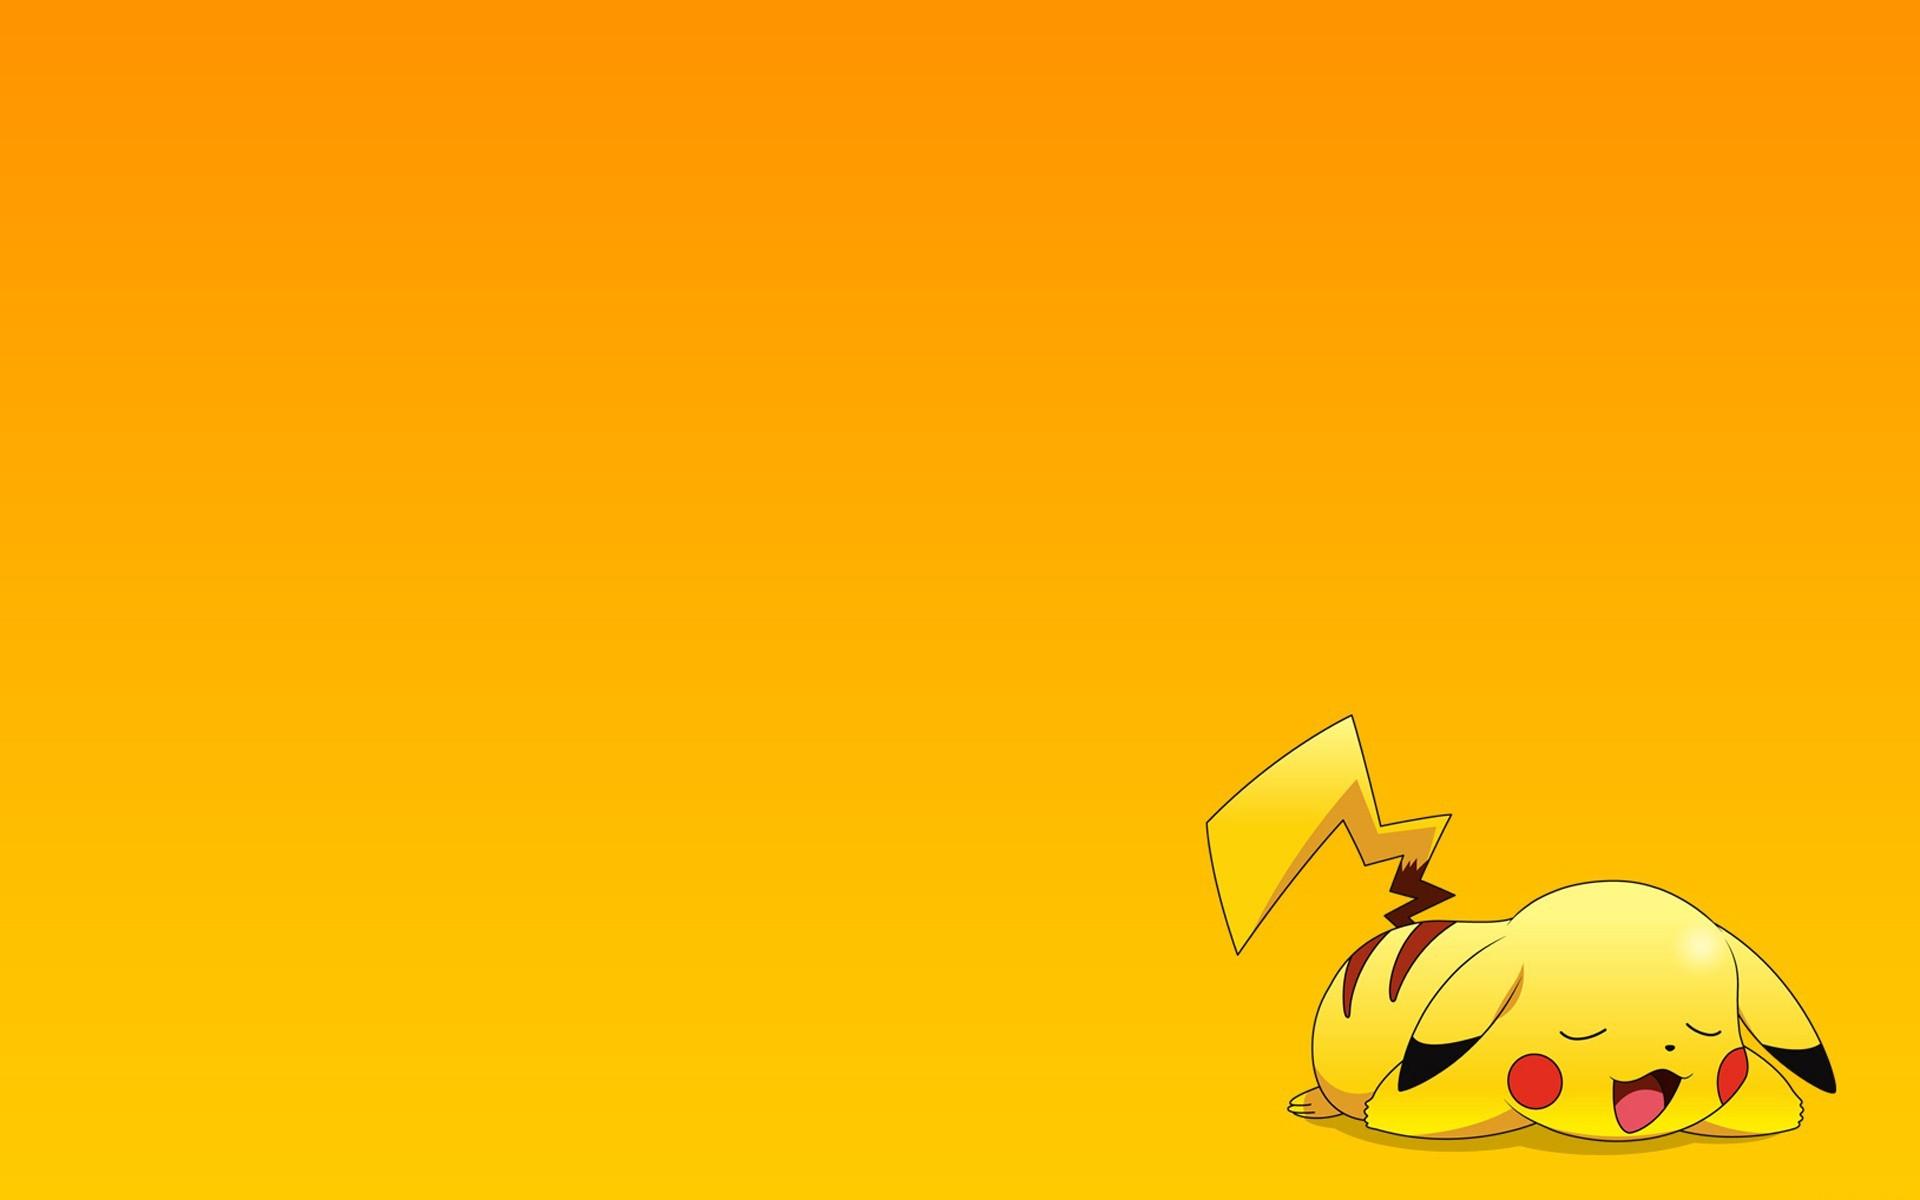 Fond d'écran : 1920 x 1200 px, Anime, Pikachu, Pokémon 1920x1200 - 4kWallpaper - 1022198 - Fond ...